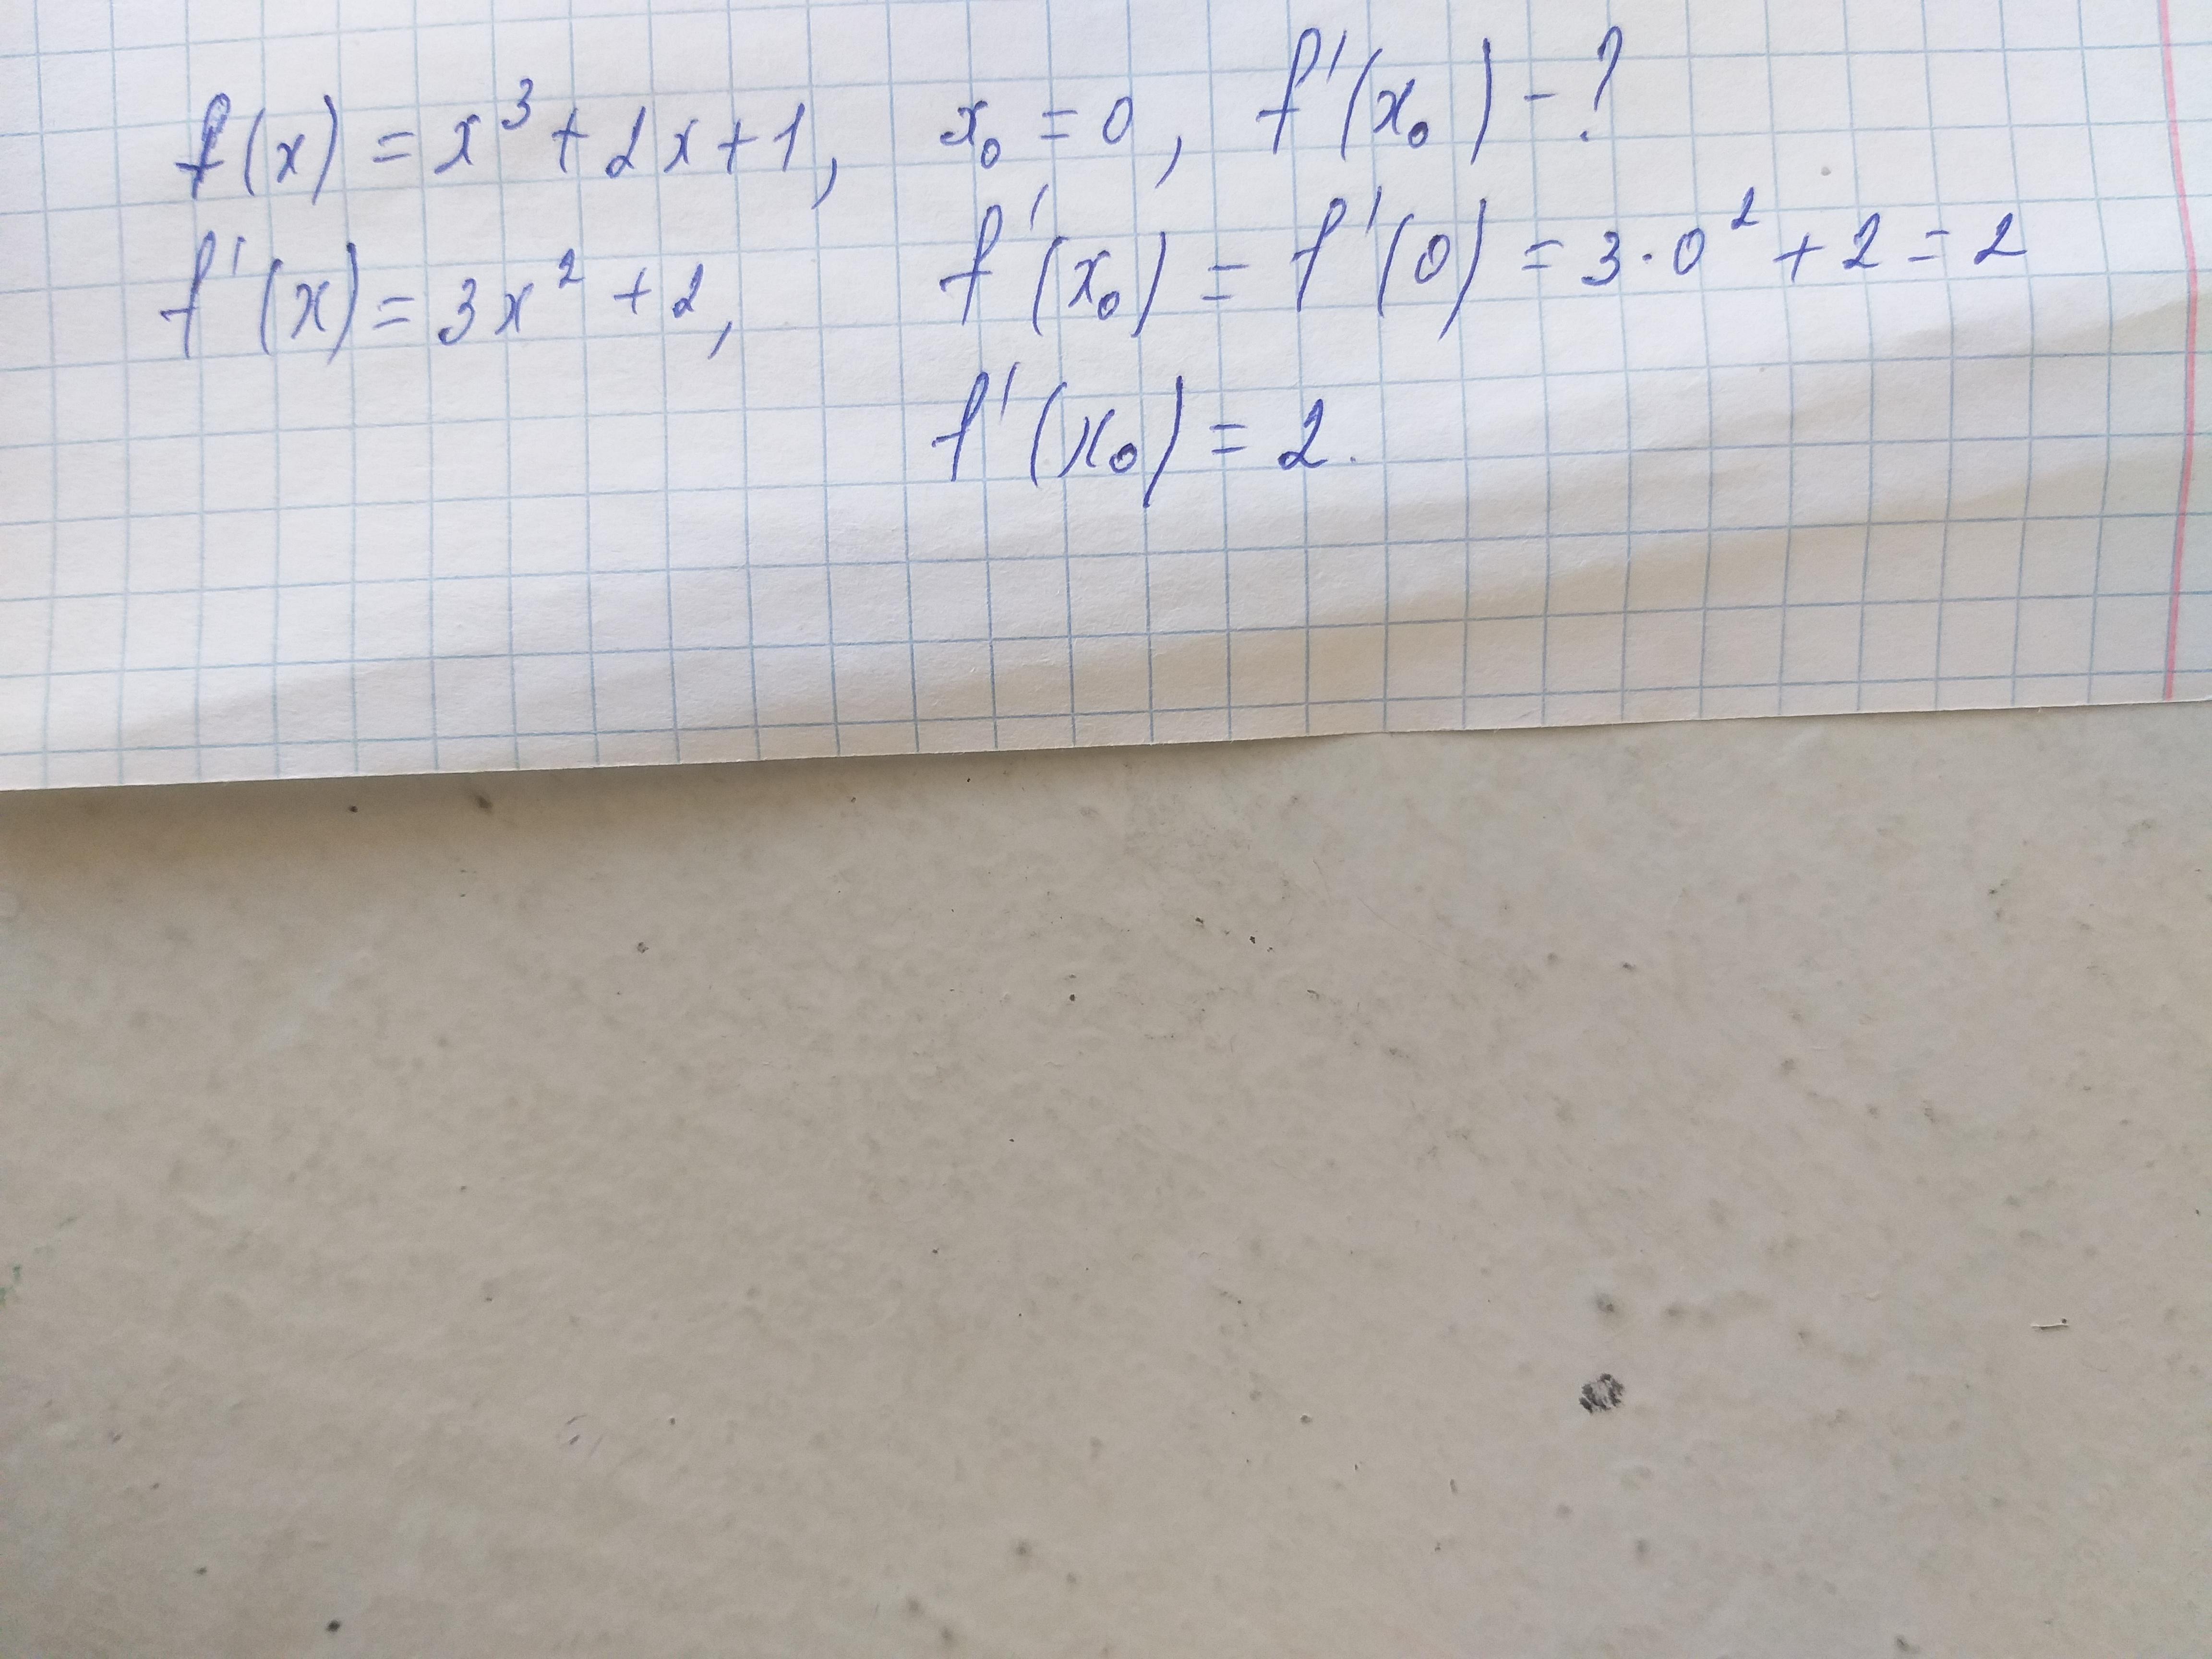 F(x)=x^3+2x+1, xo=0Знайти похiдну